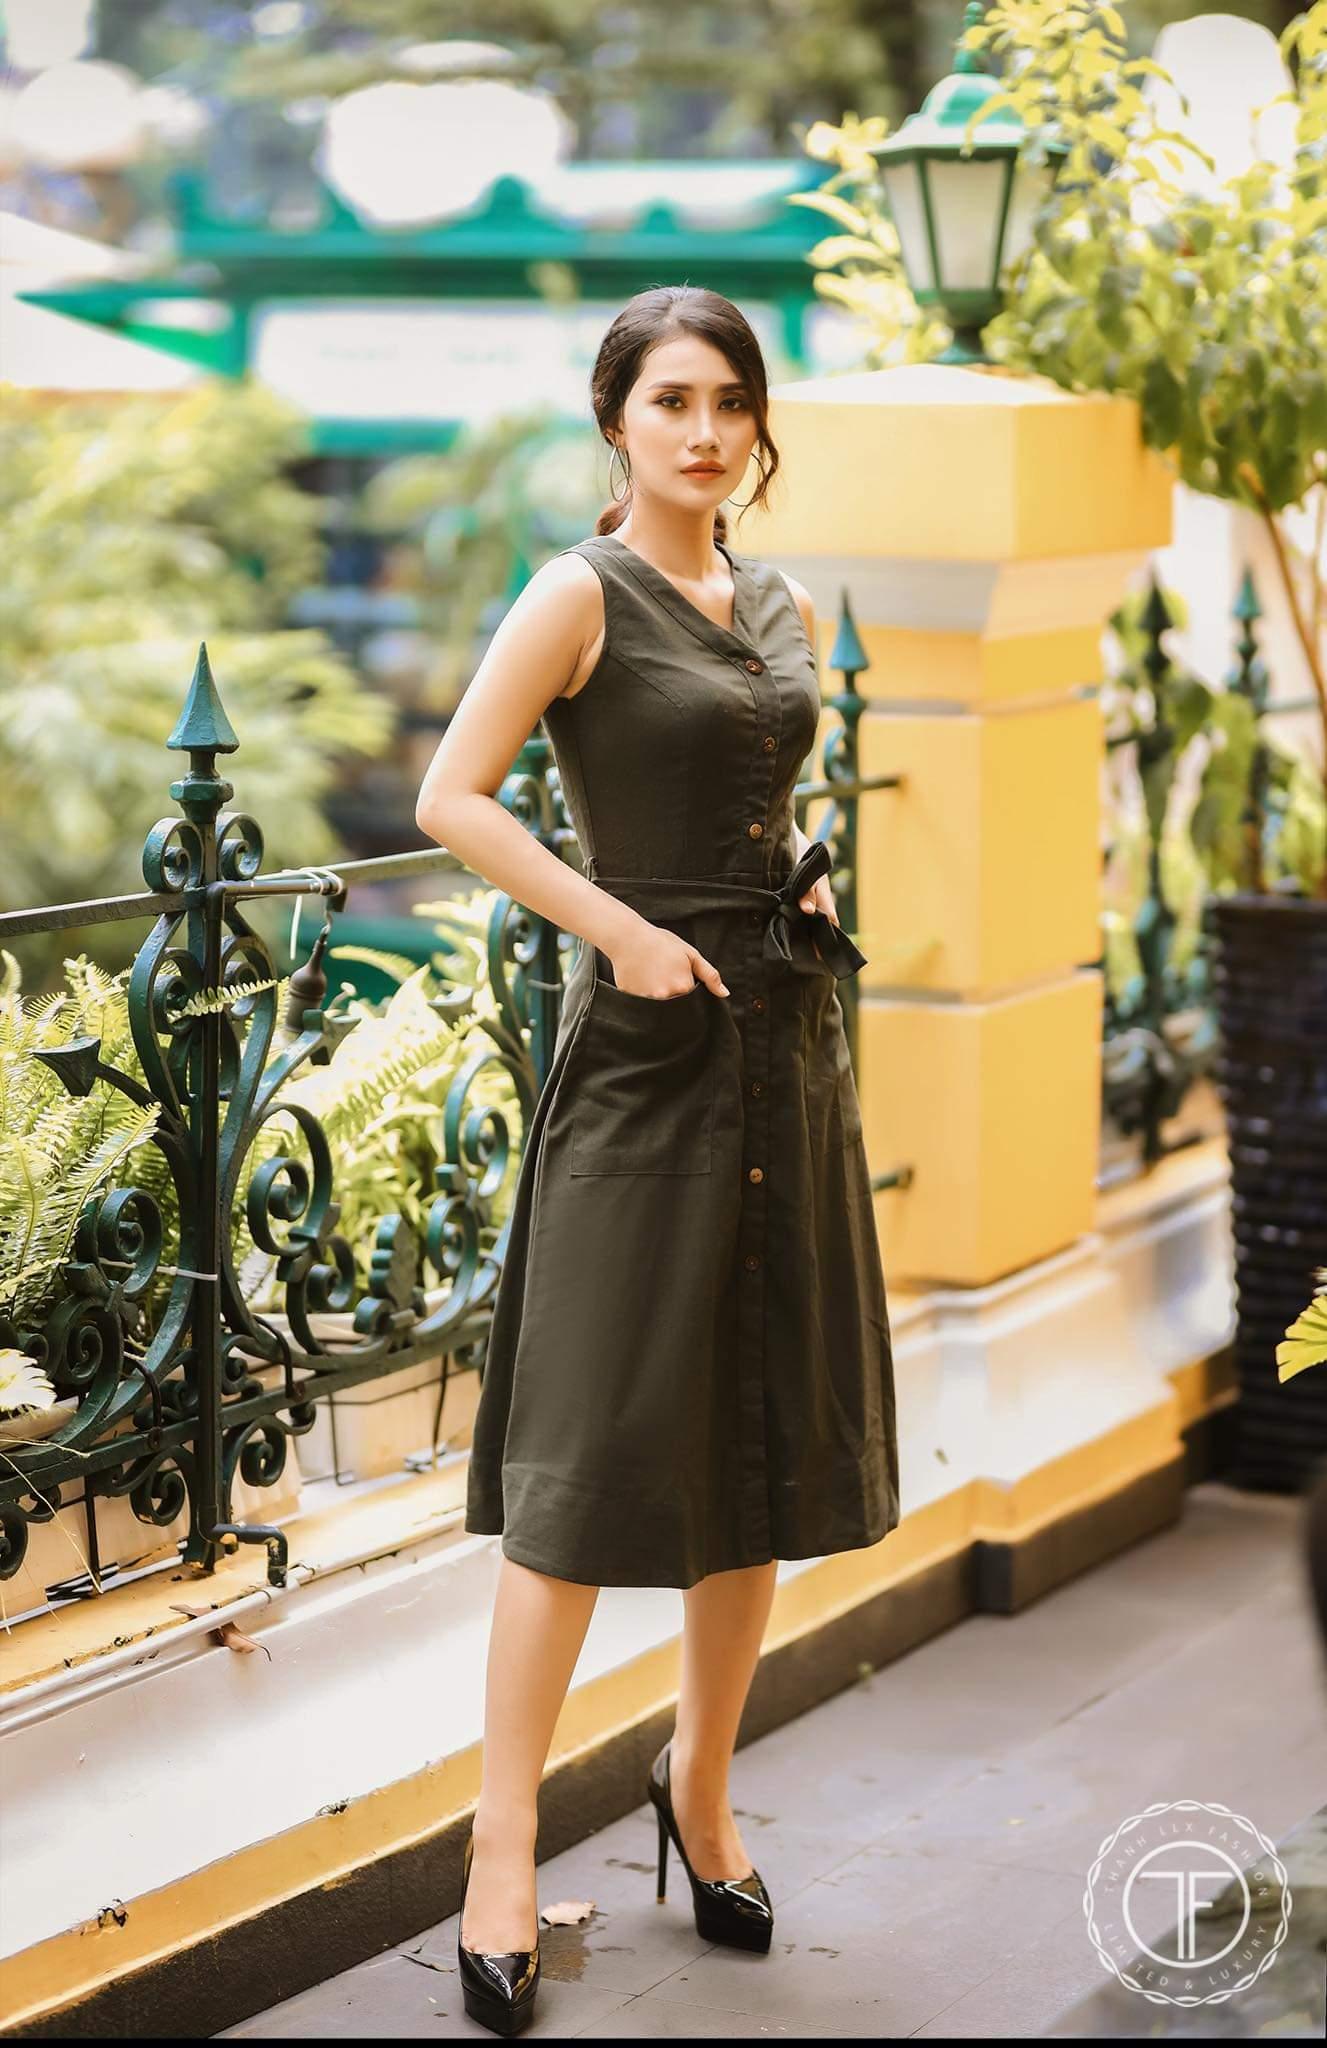 Sam - Huỳnh Thị Thu Hòa